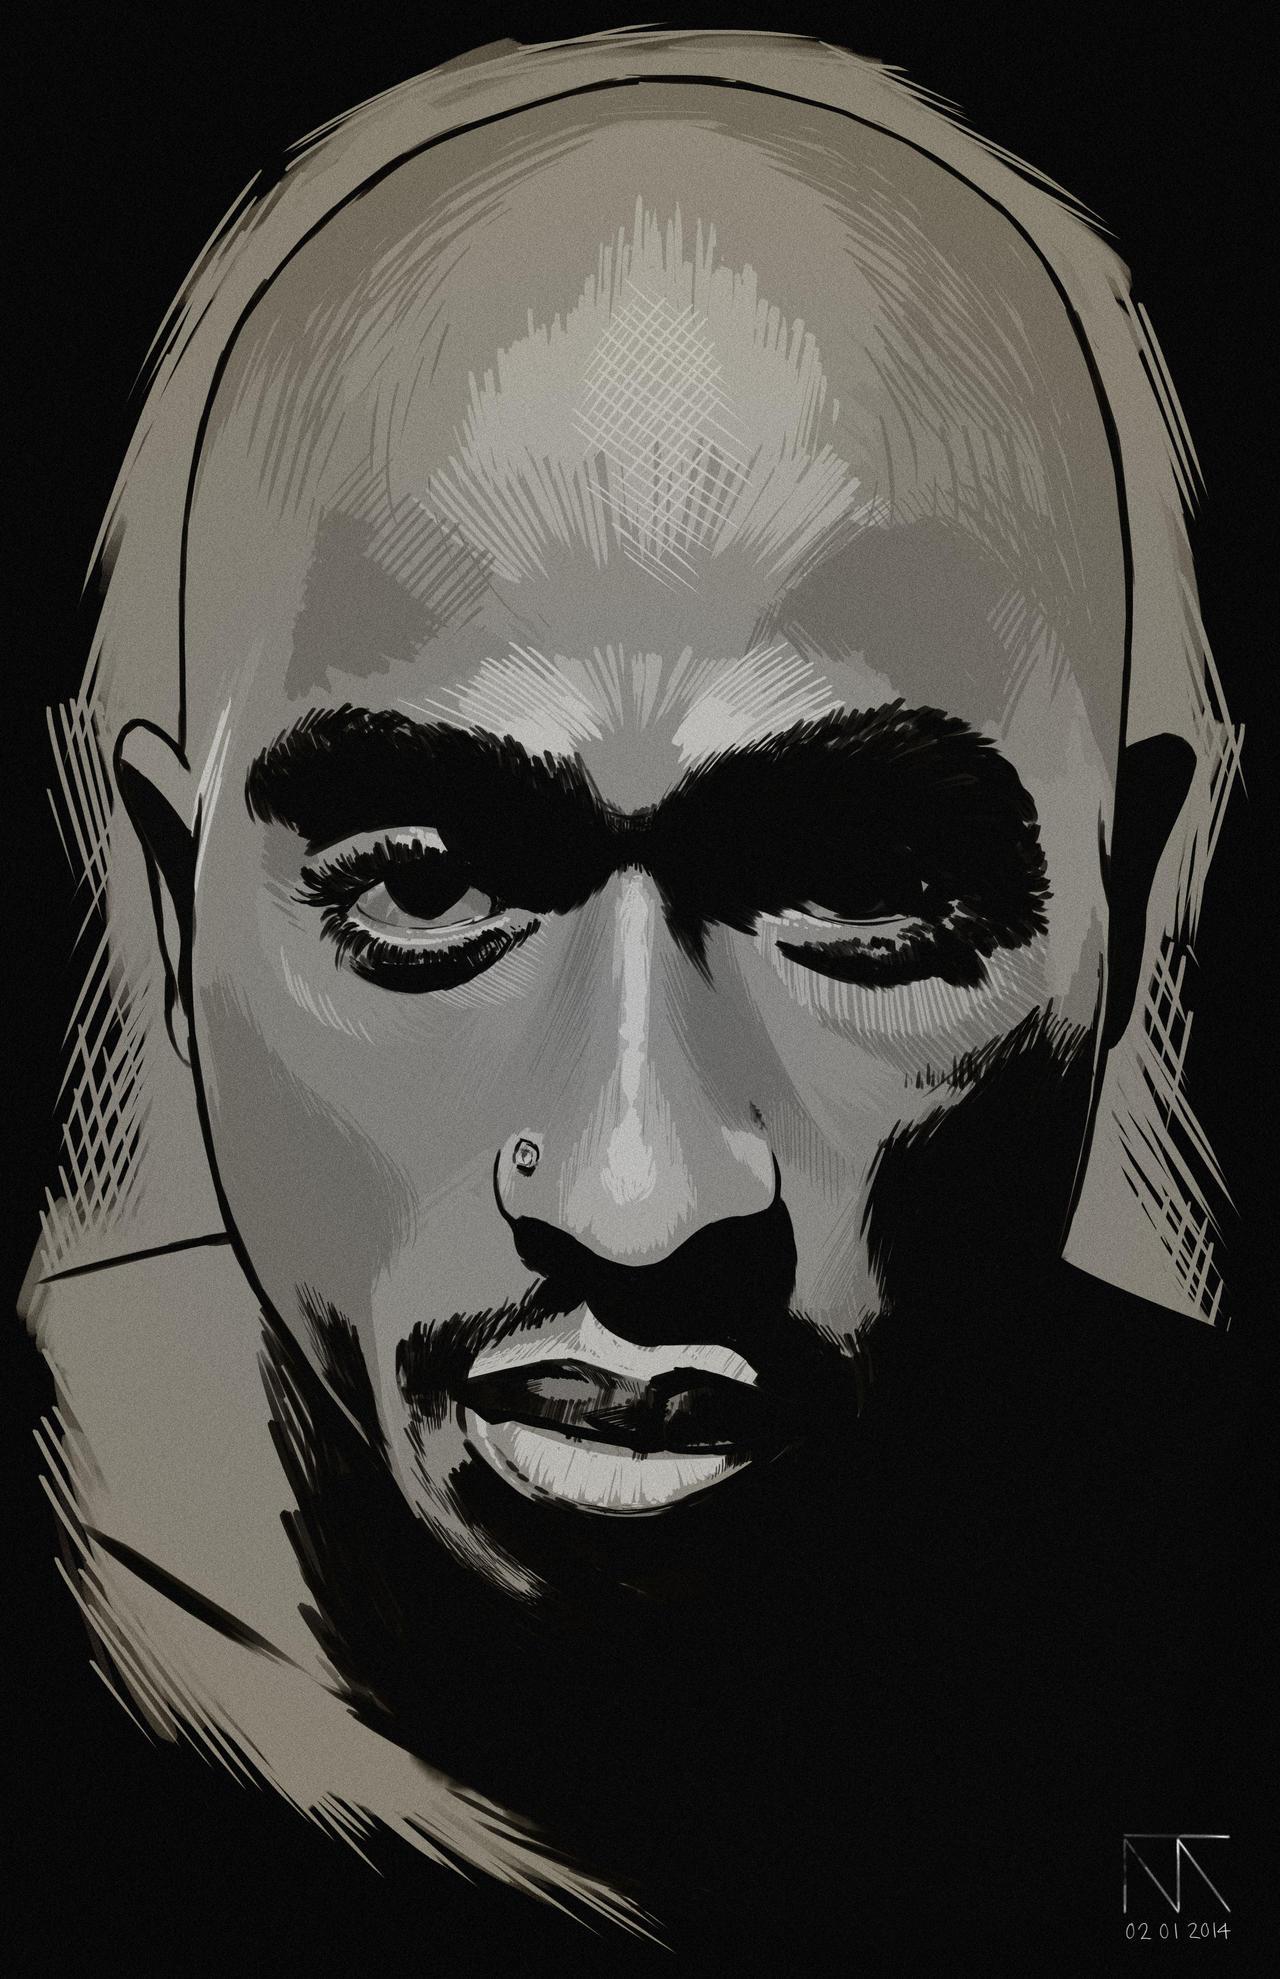 Tupac by MyPseudonym7 on deviantART